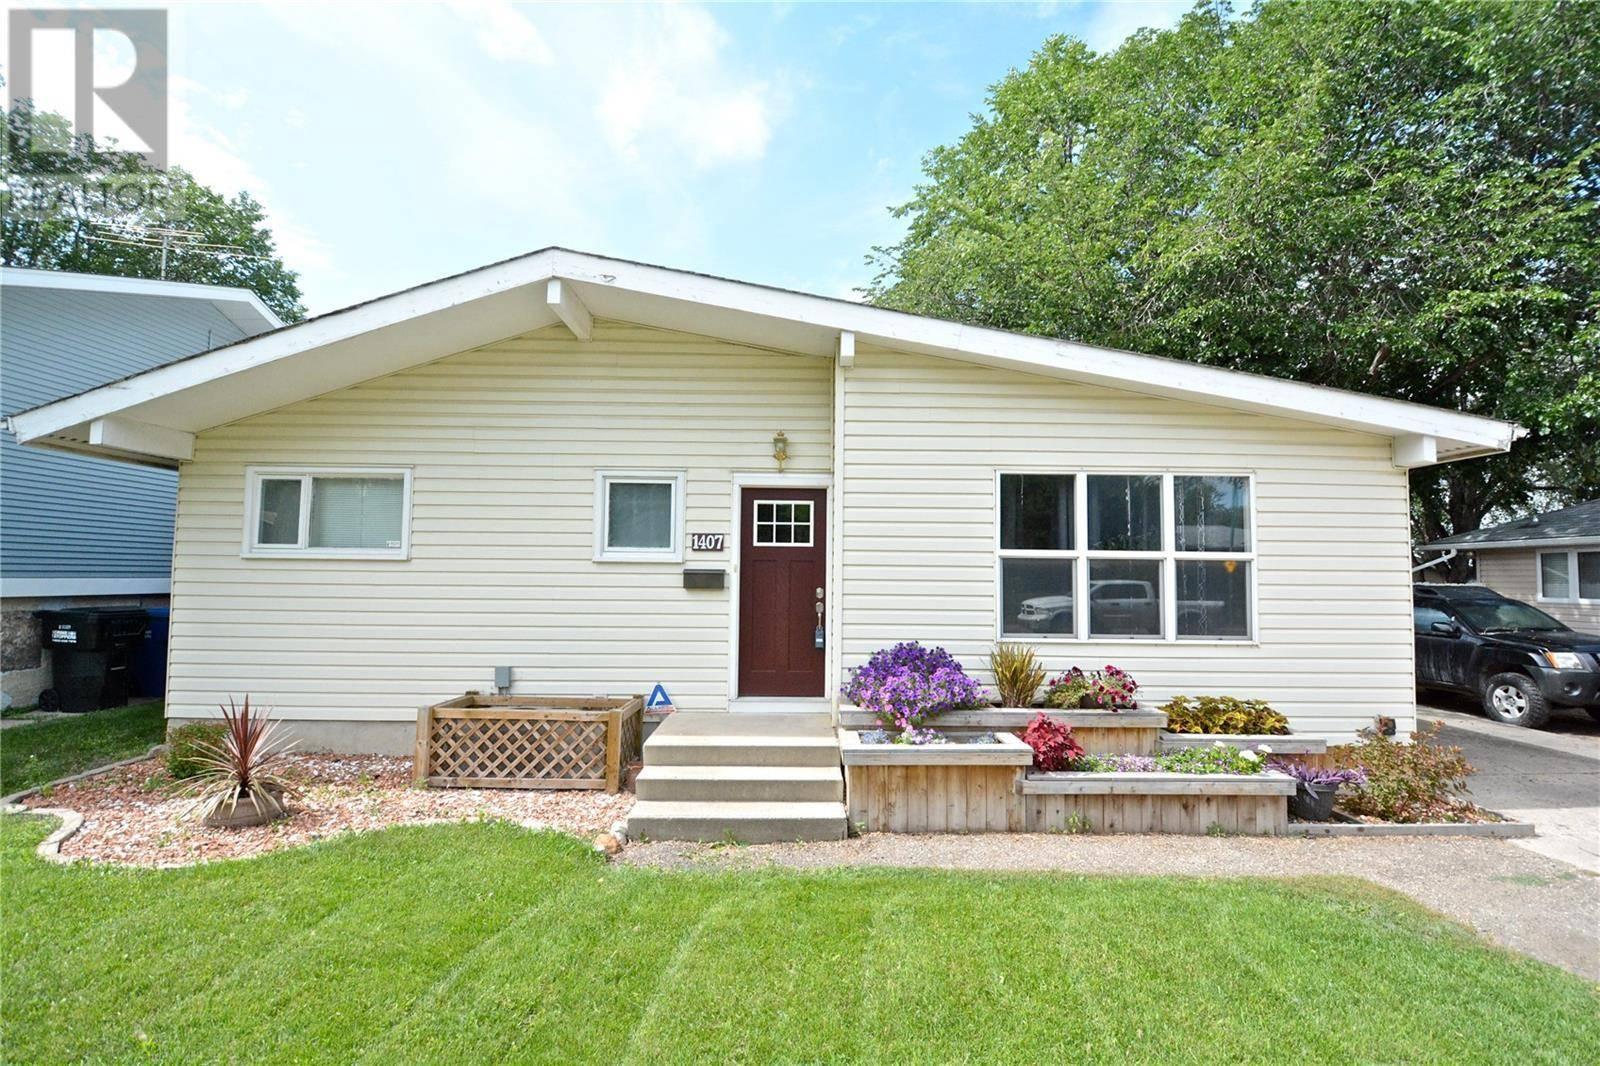 House for sale at 1407 I Ave N Saskatoon Saskatchewan - MLS: SK783329